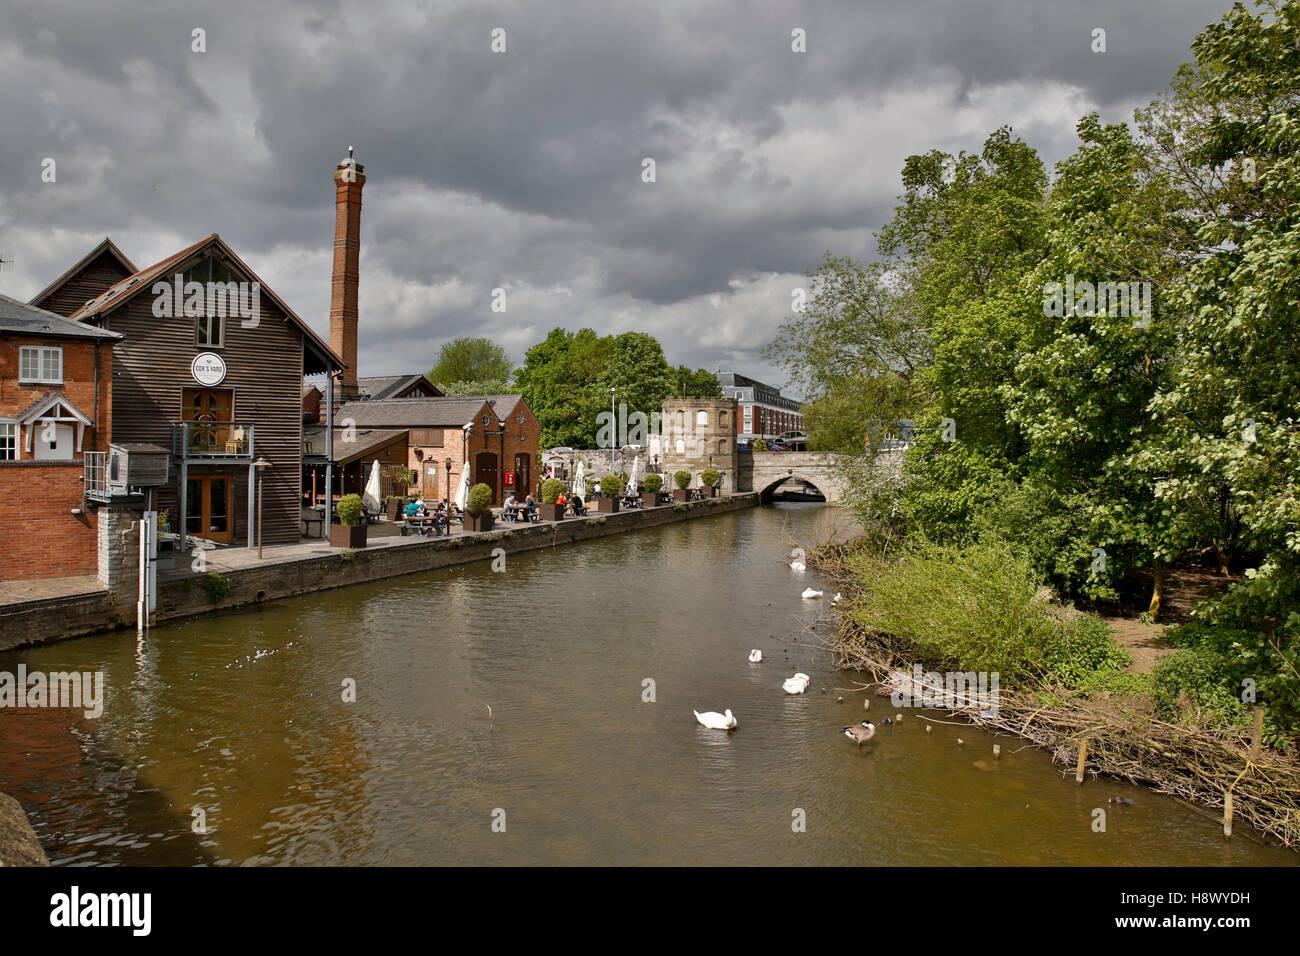 Stratford Upon Avon; River Avon; UK - Stock Image